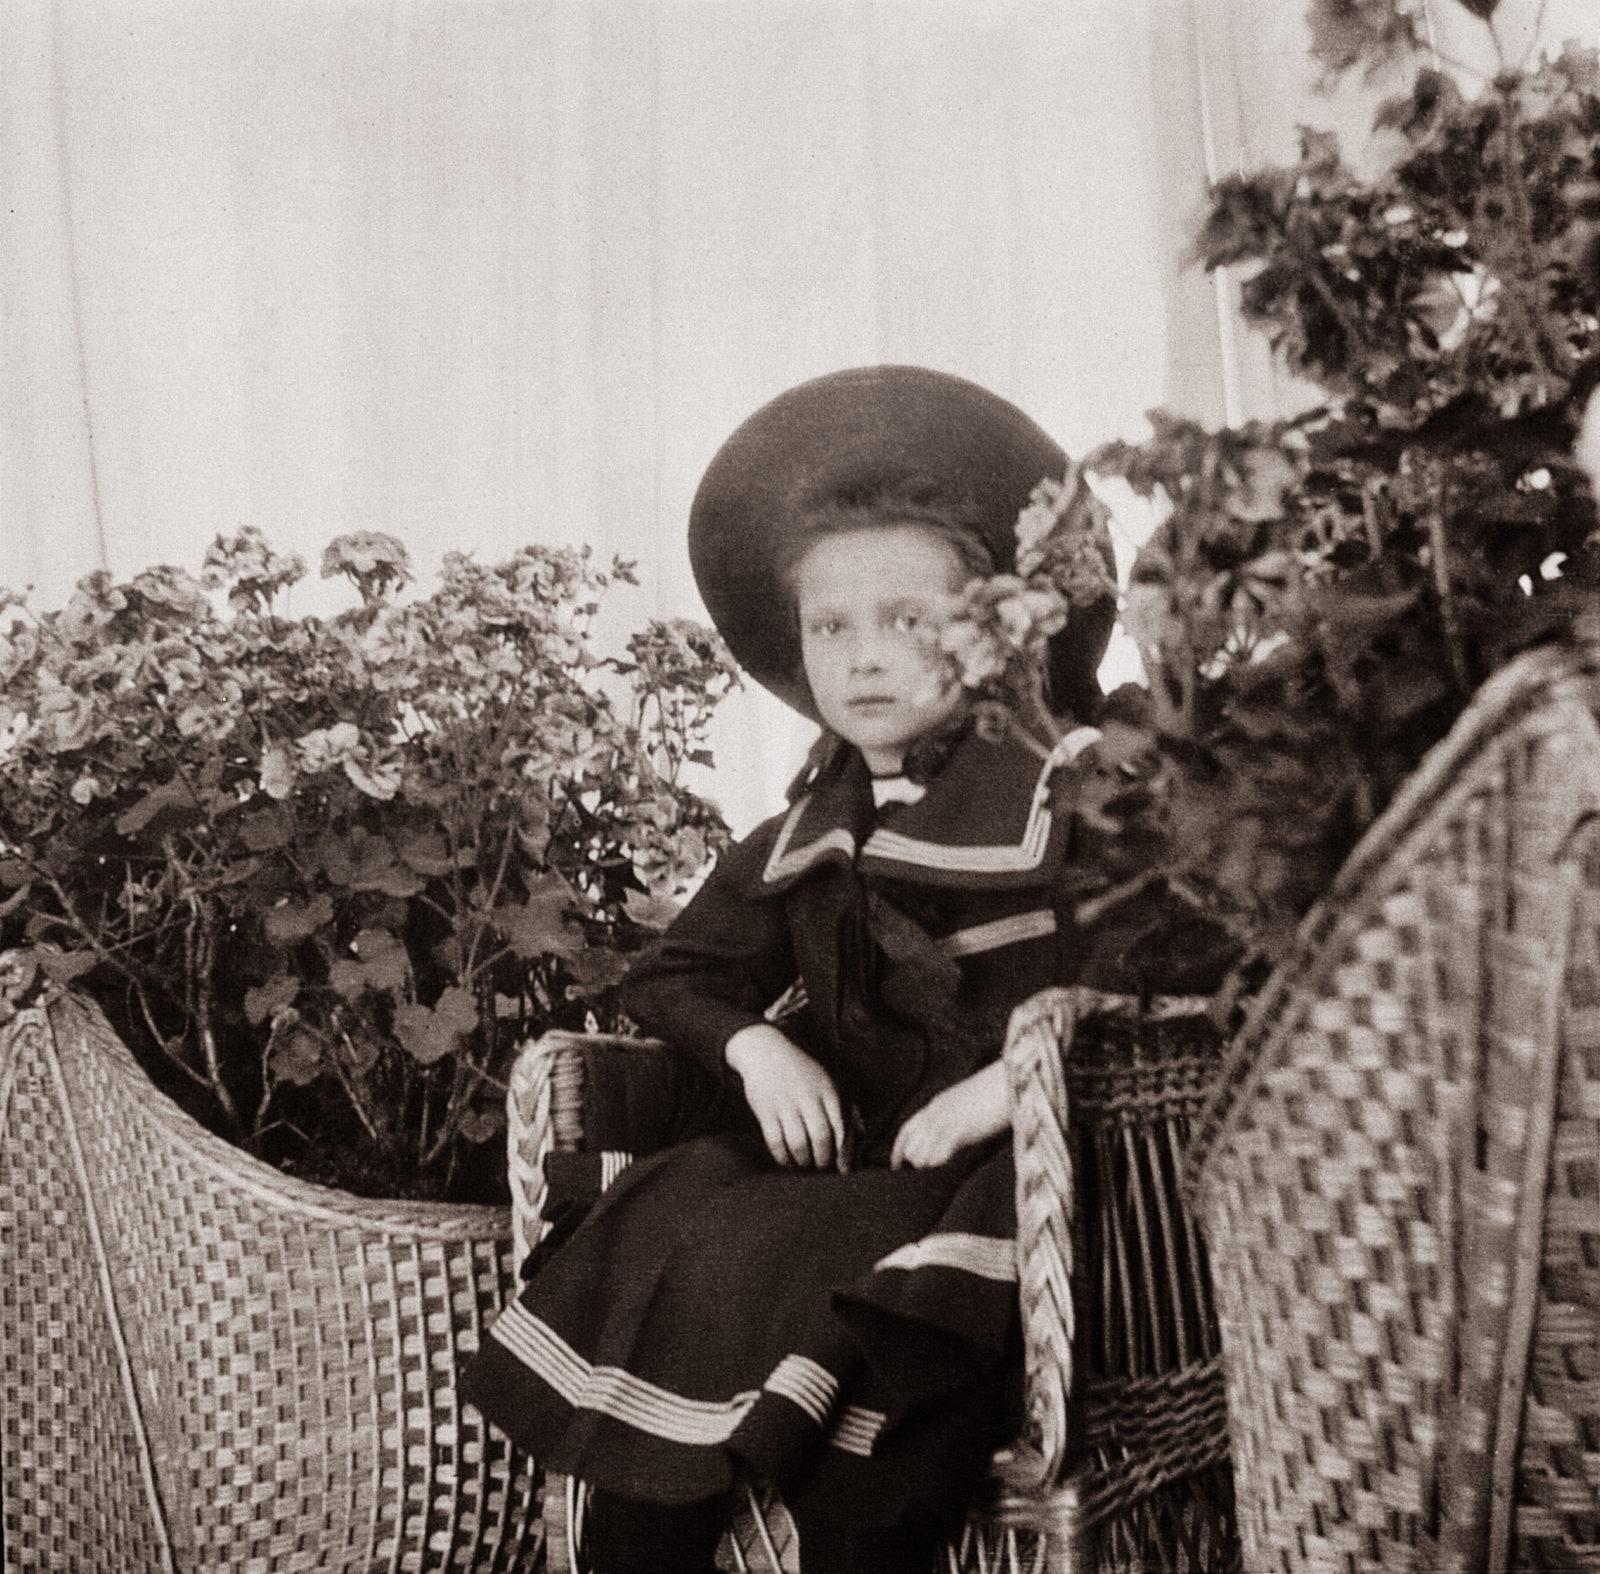 Grand Duchess Tatiana Nikolaevna. The second daughter of Emperor Nicholas II and Empress Alexandra Feodorovna. At home. Children's photo of 1904.